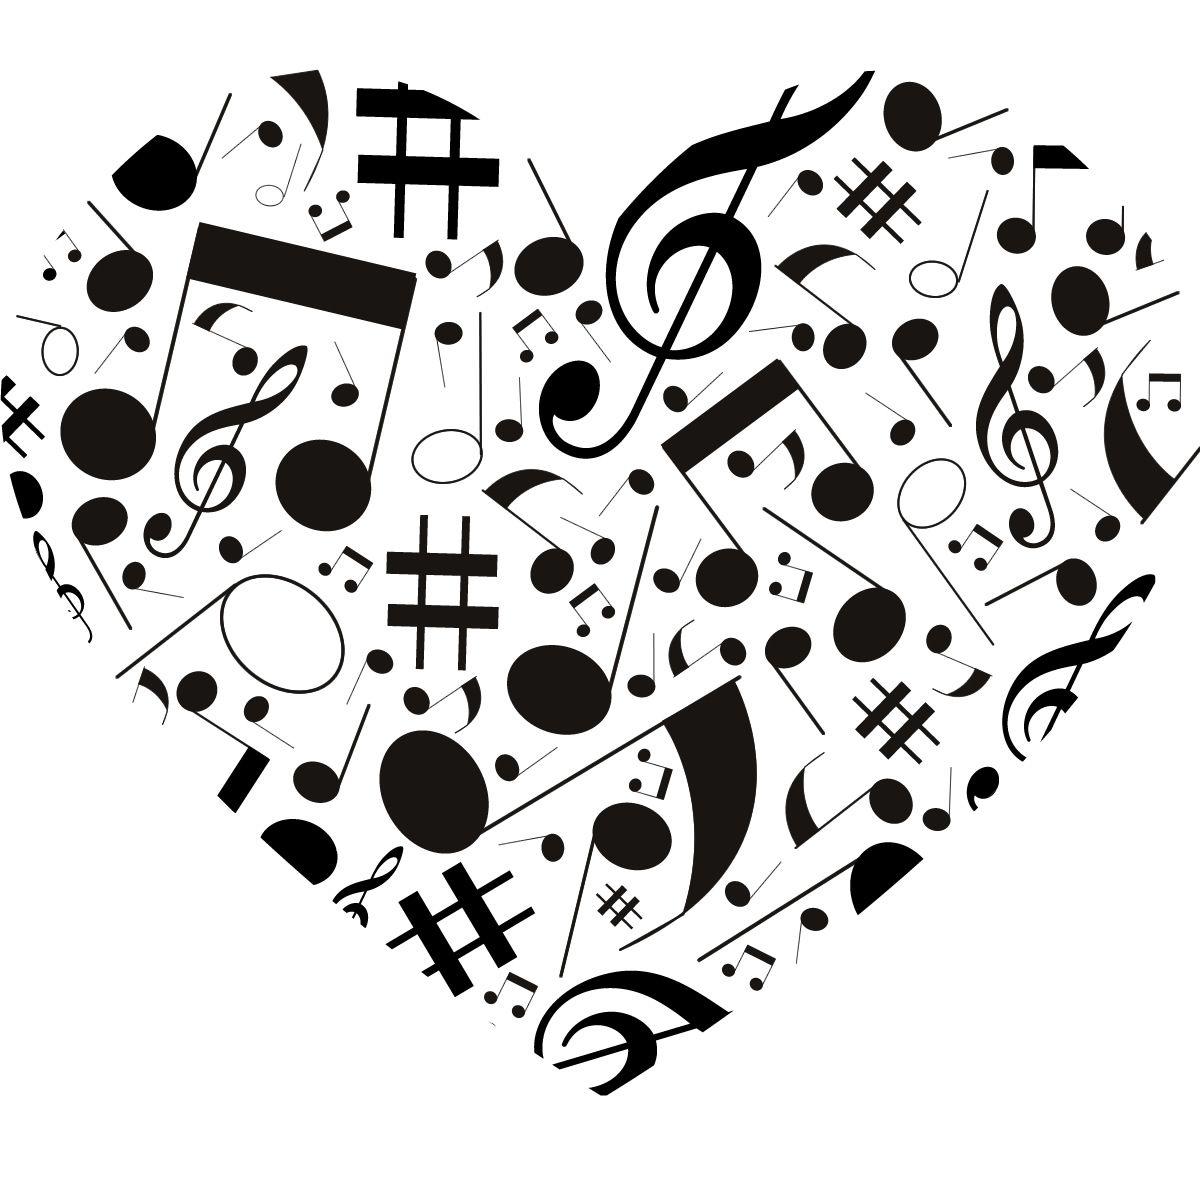 Details about Musical Note Love Heart Wall Art Sticker